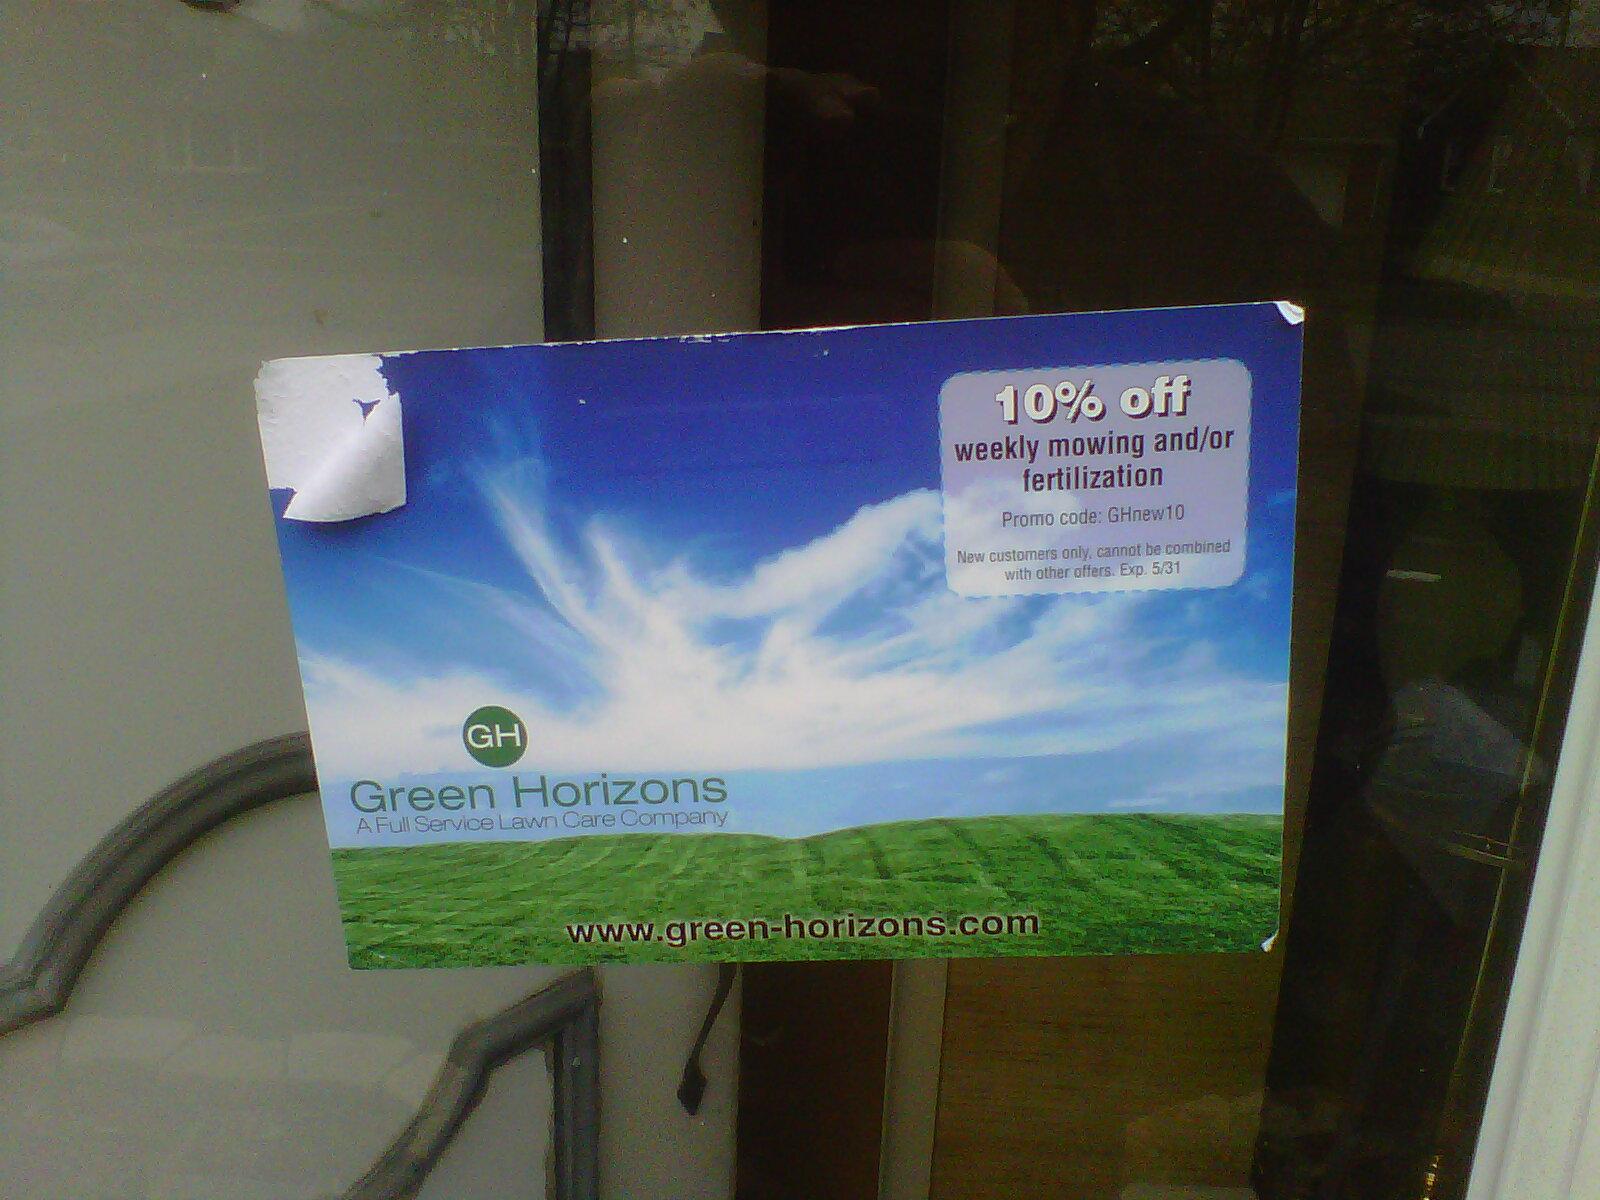 Green Horizons Inc 6980 Oxford St Ste 220 Minneapolis Mn 55426 Yp